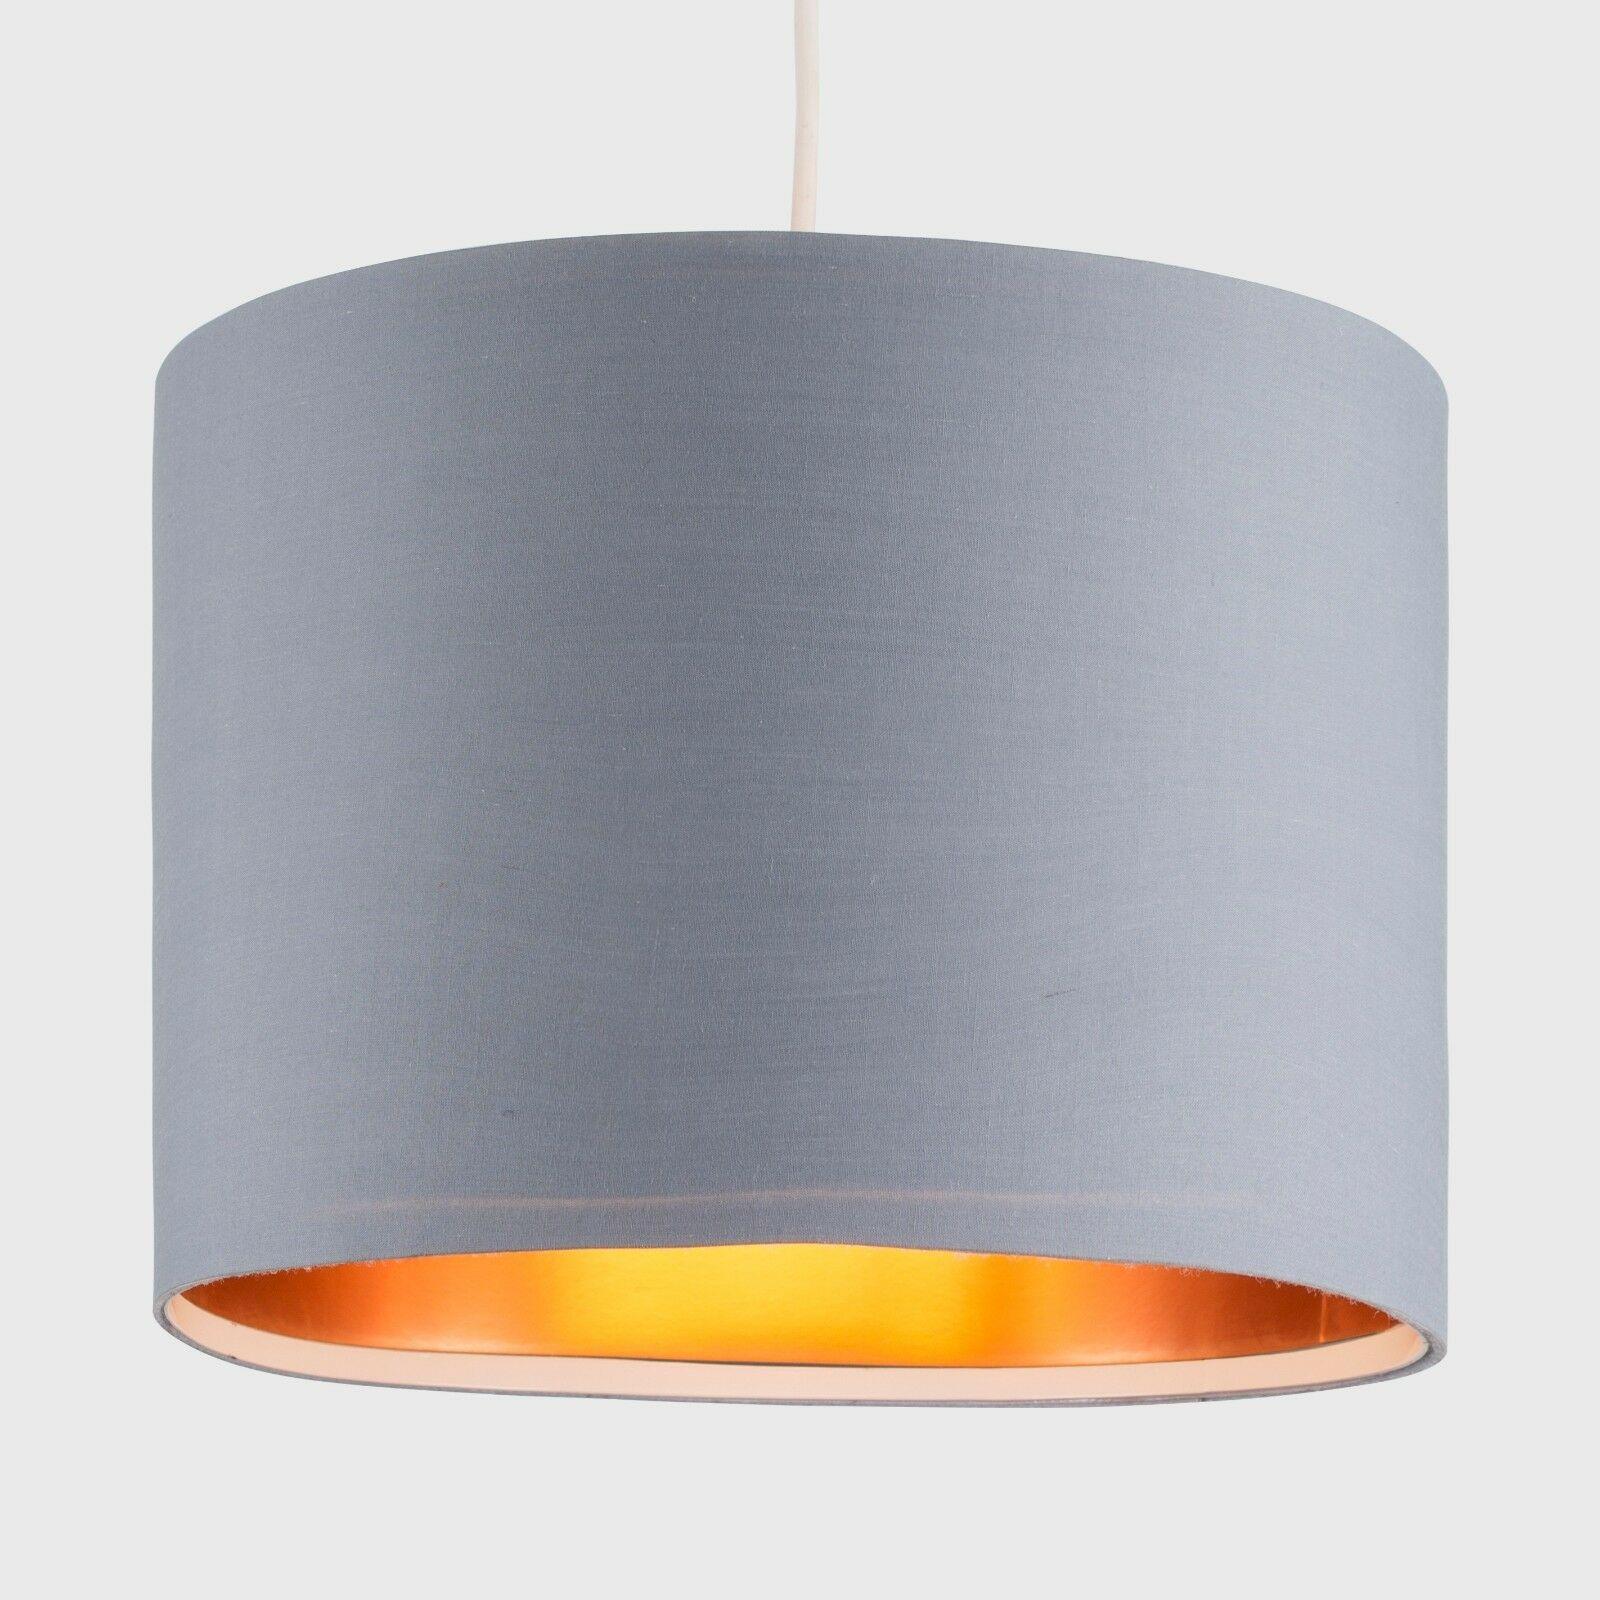 Tela-moderna-algodon-facil-ajuste-Techo-Colgante-Pantalla-De-Mesa-tonos-de-luz-de-tambor miniatura 132